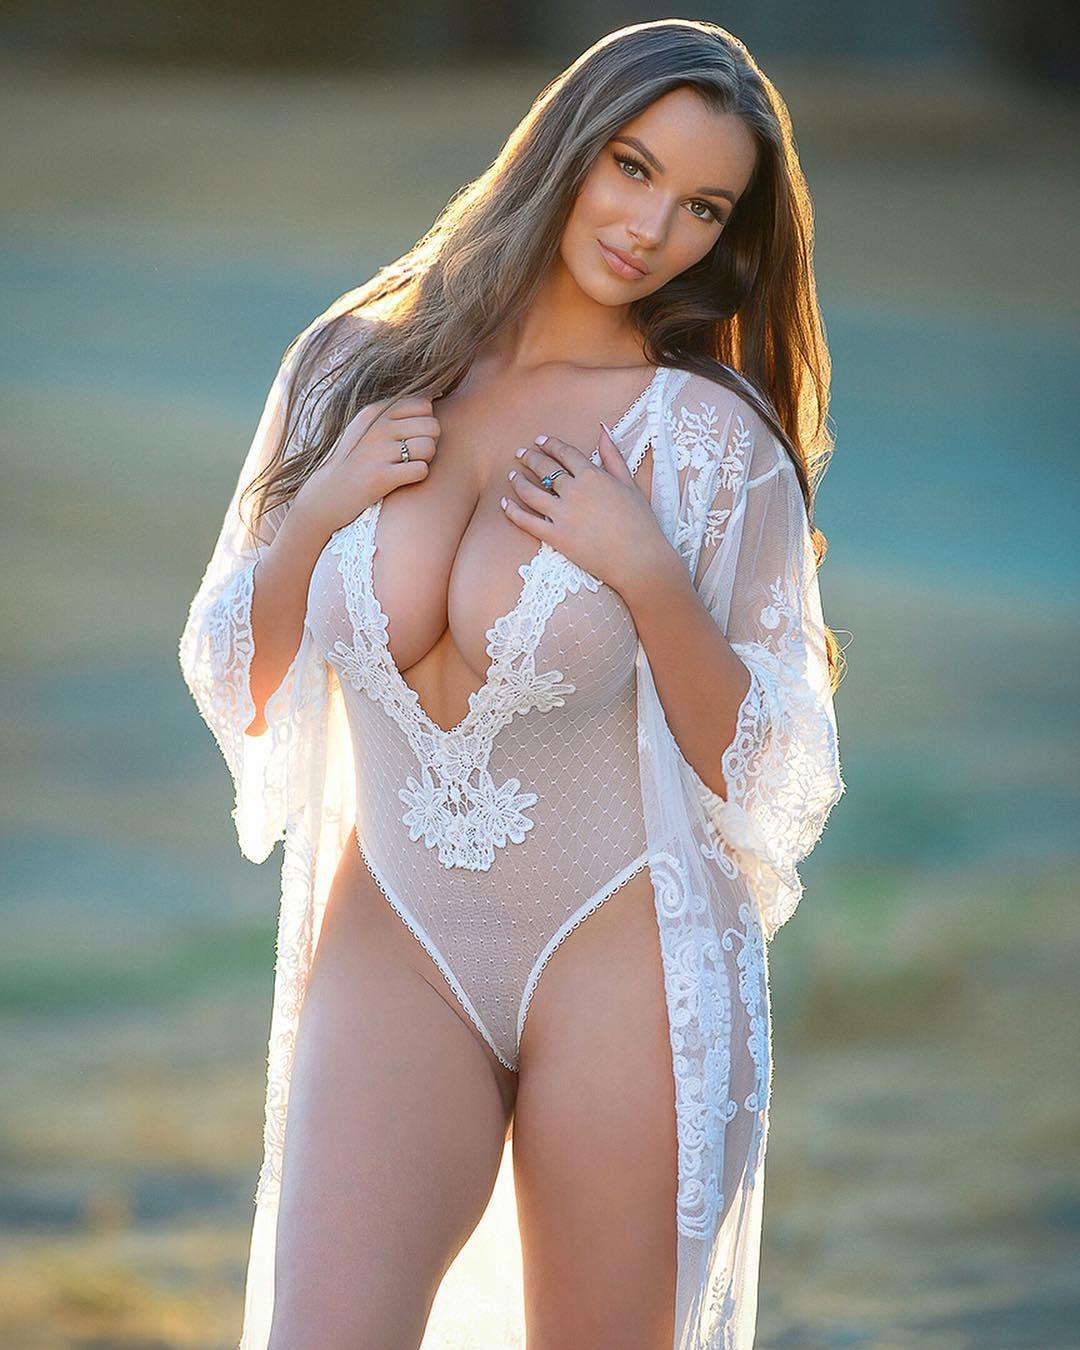 Mary Haze - Model page